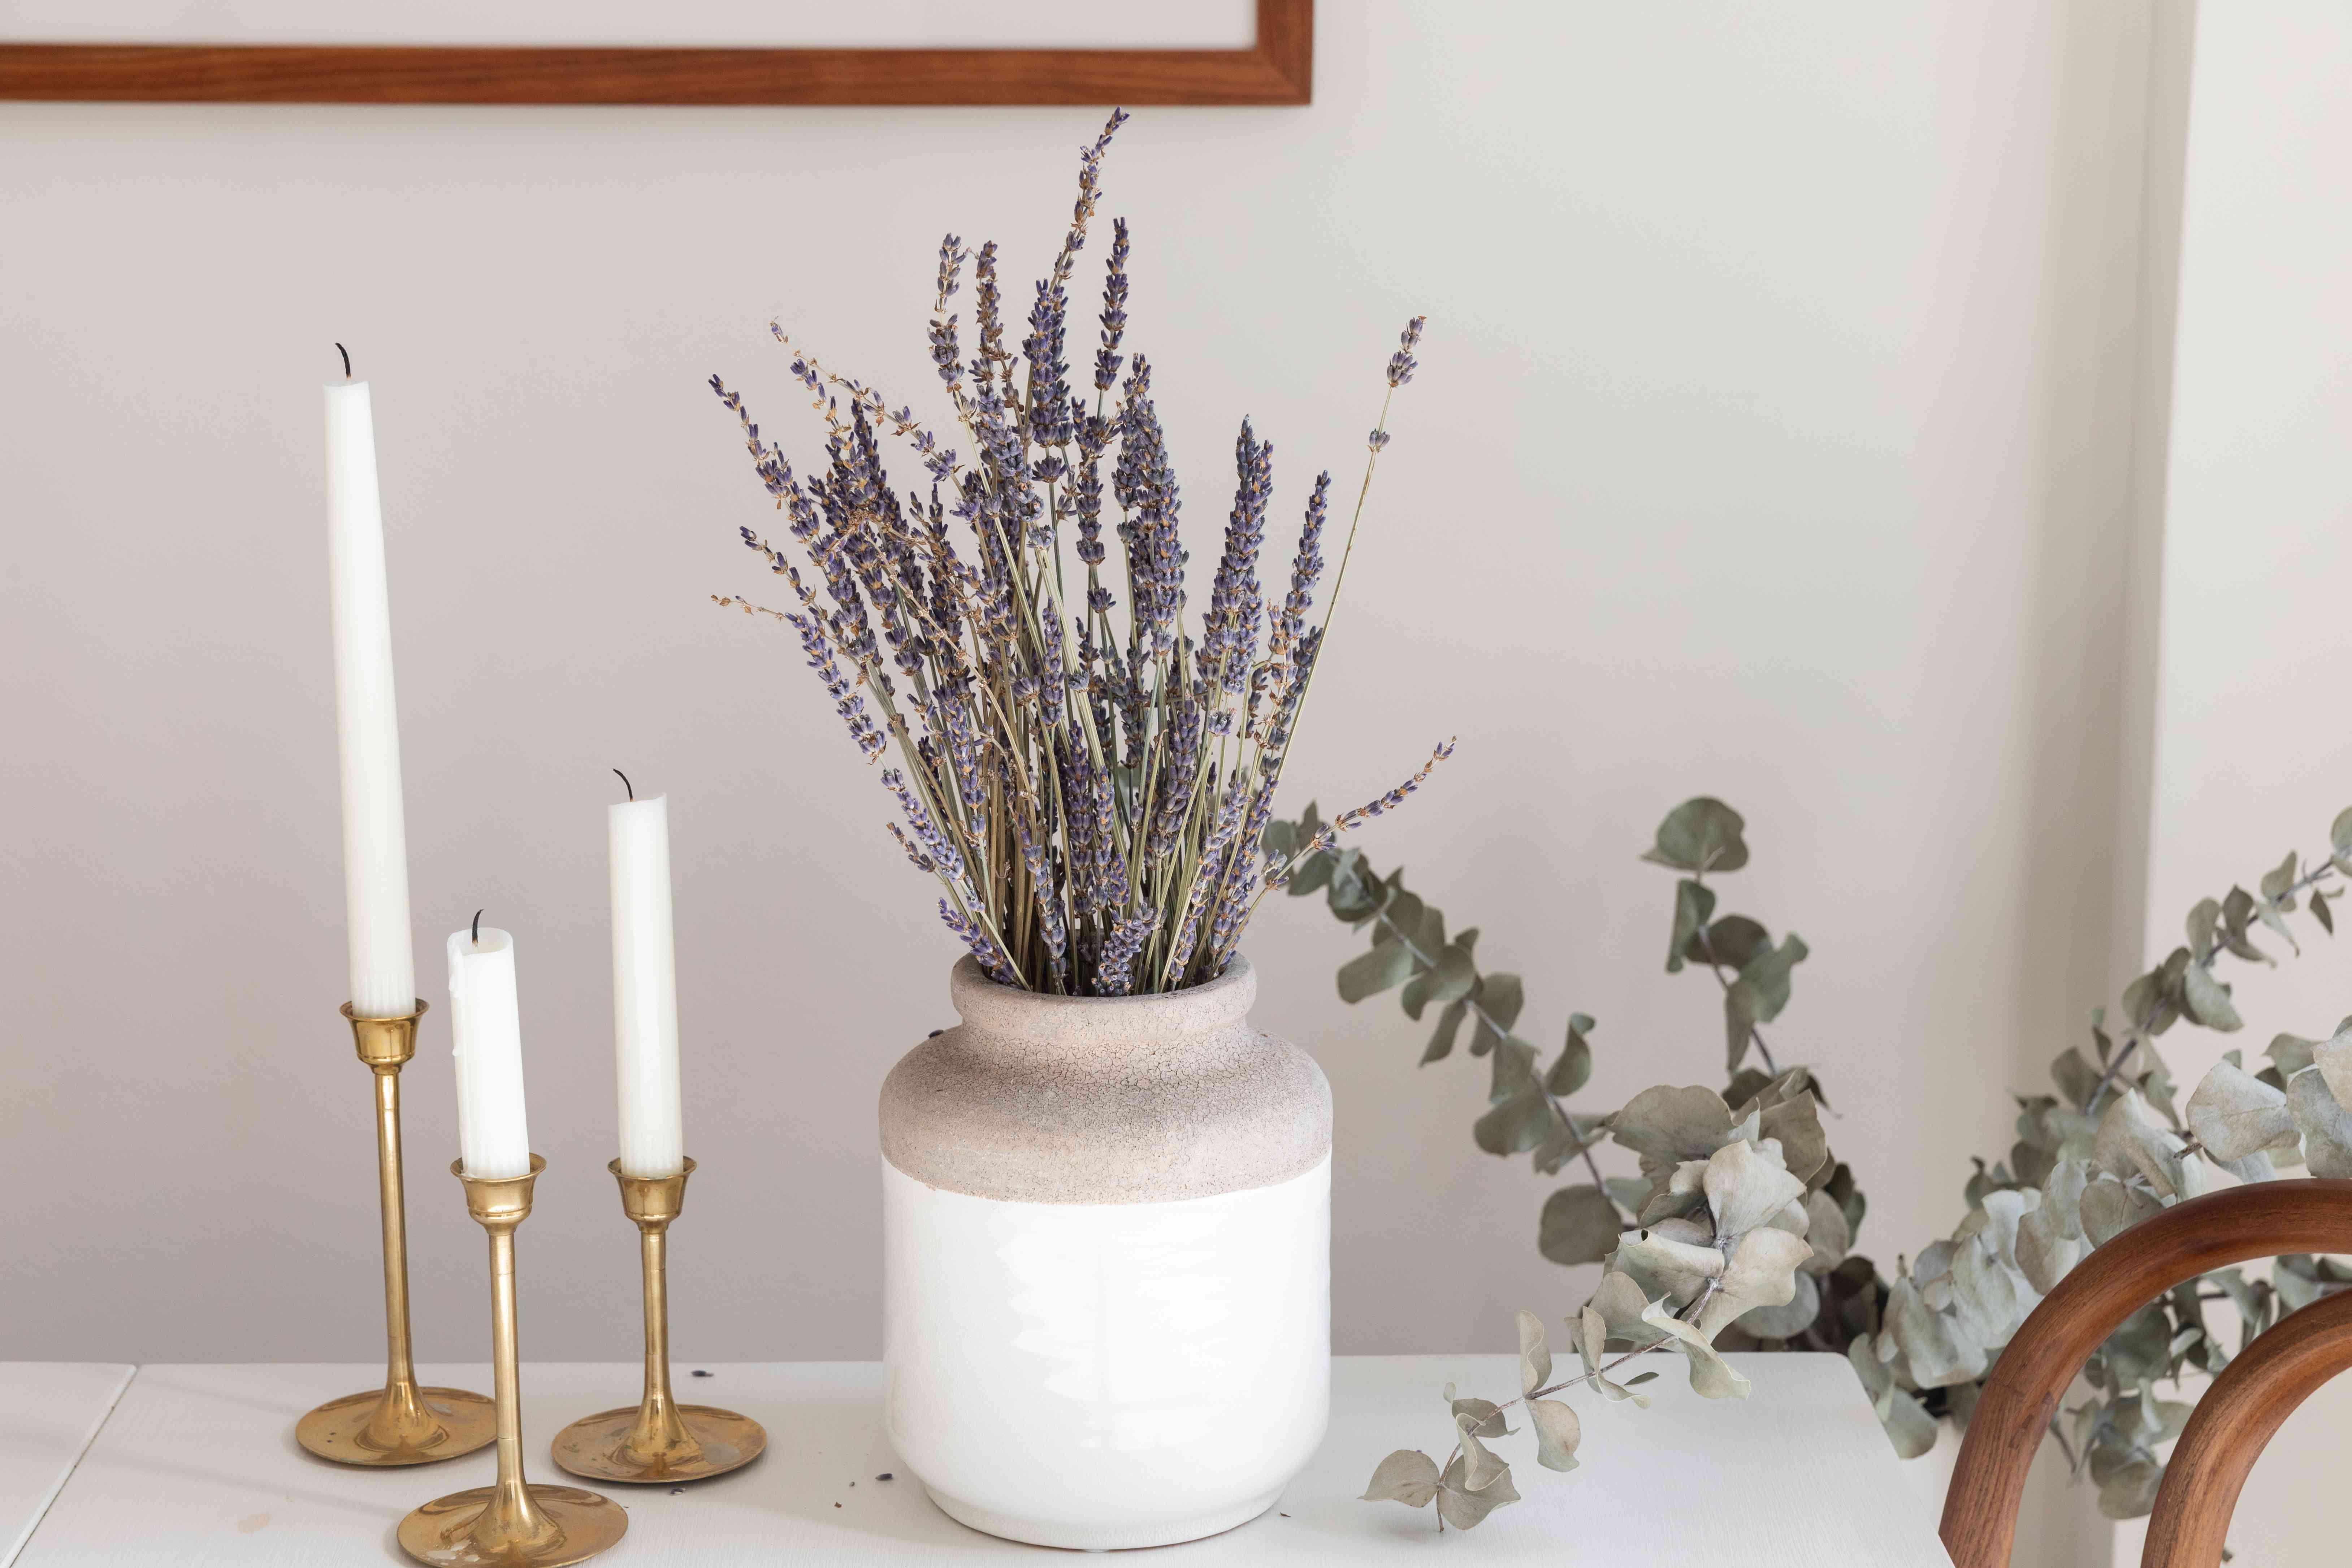 Lavender displayed in white and tan ceramic vase